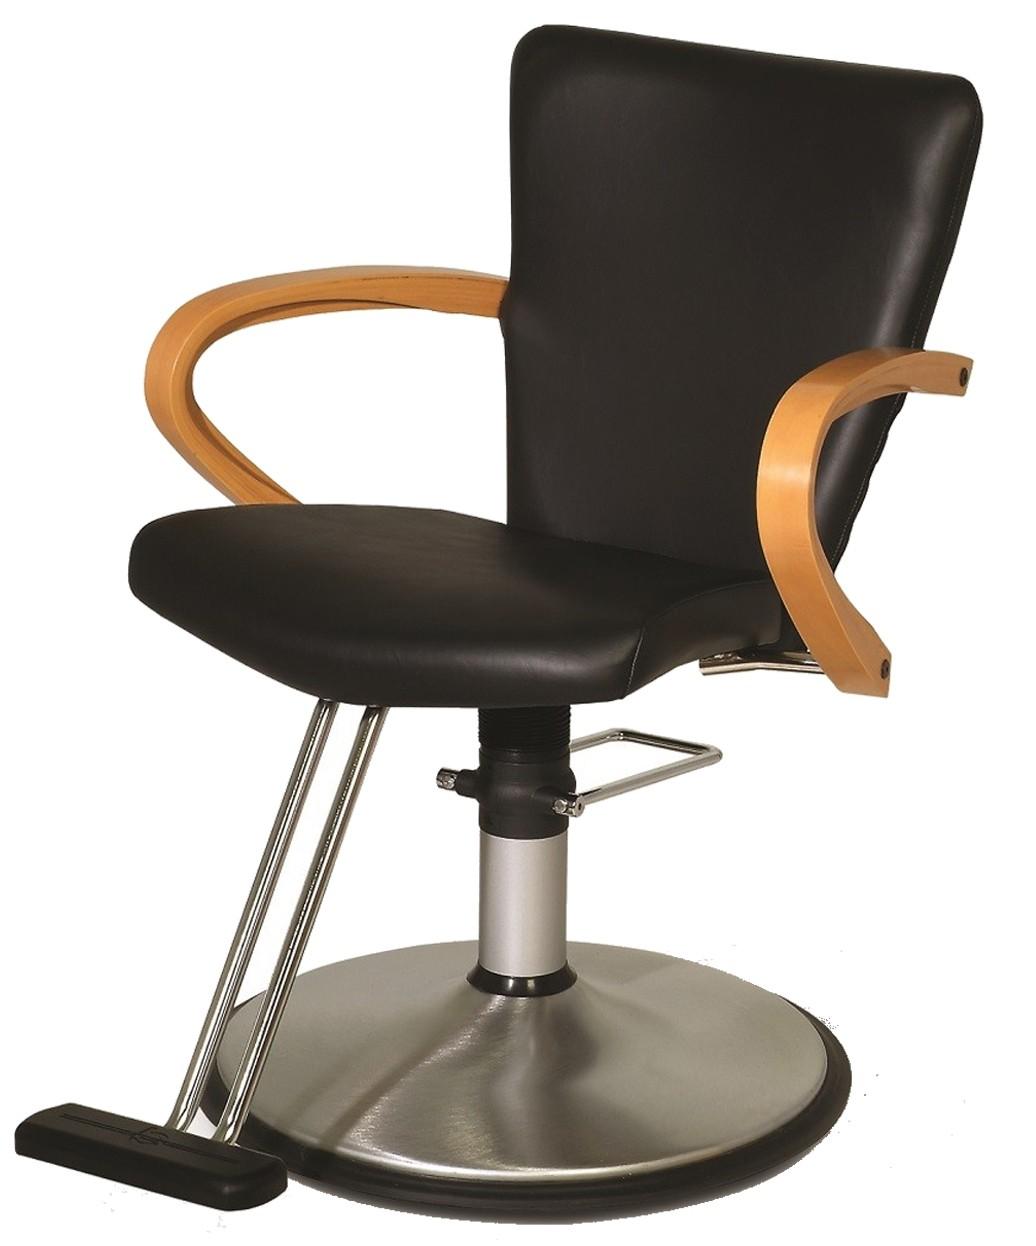 belvedere dd12a caddy styling chair rh buyritebeauty com